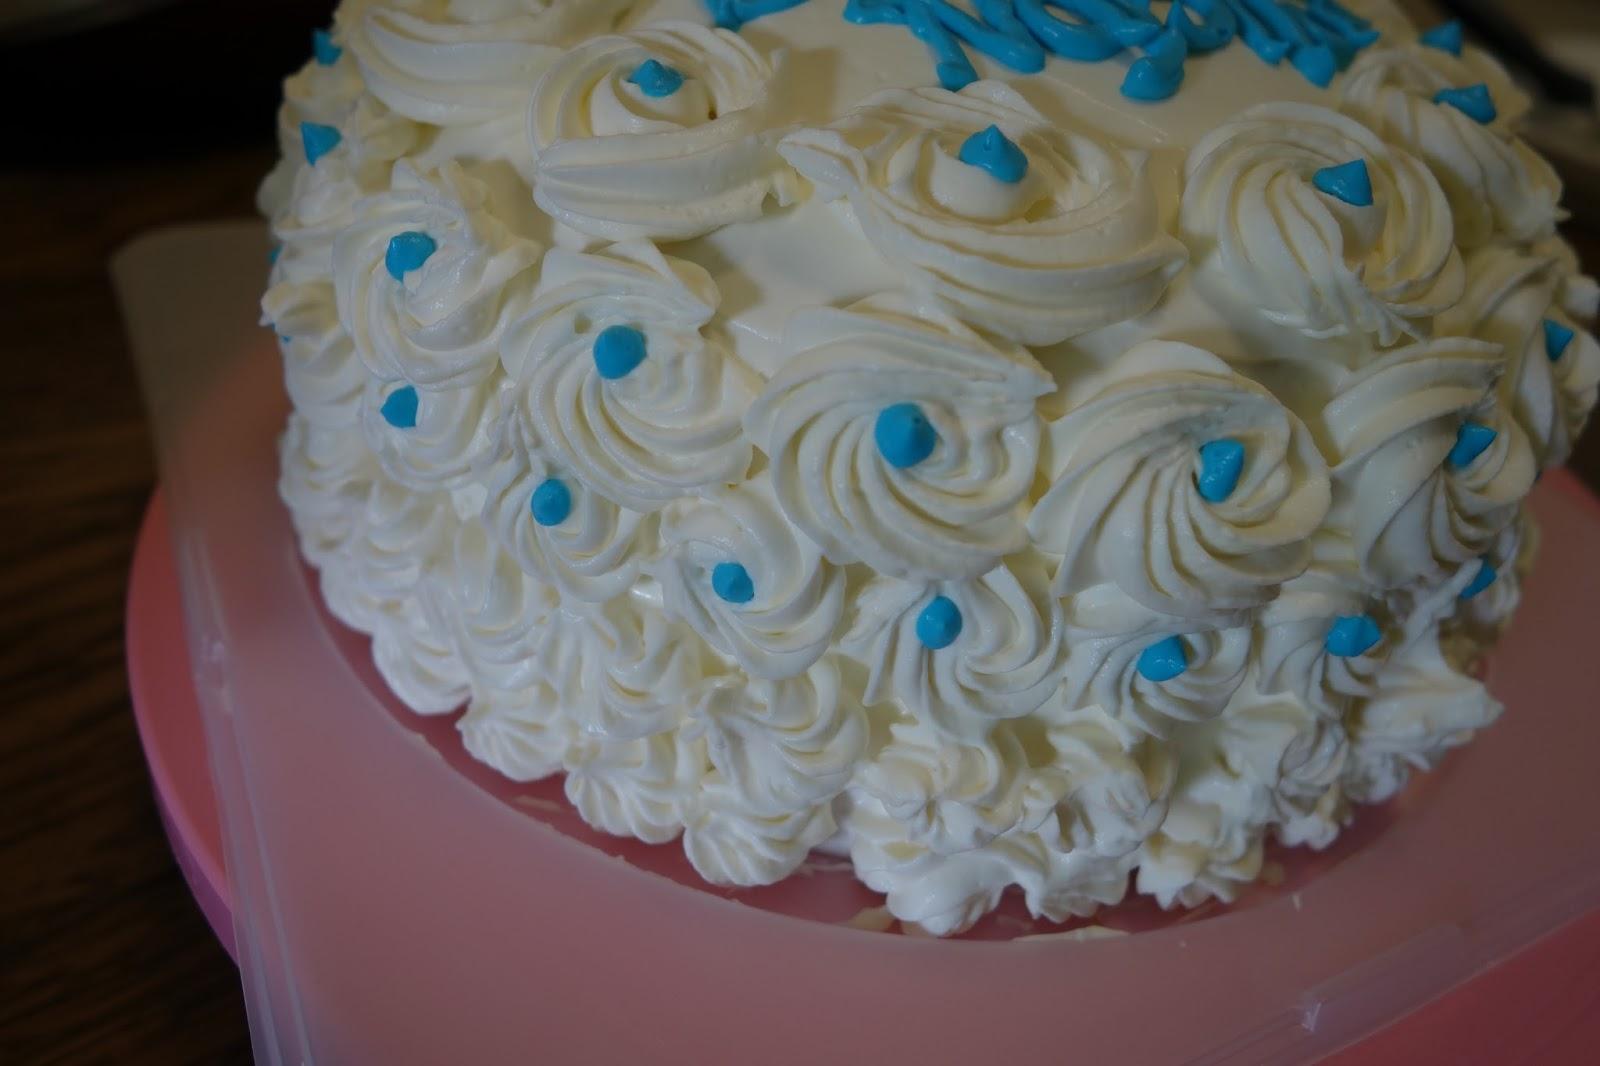 Hummingbird Cake Recipe Joy Of Baking: Nanyfadhly: Resepi Kek Hummingbird Menggunakan Kacang Walnut